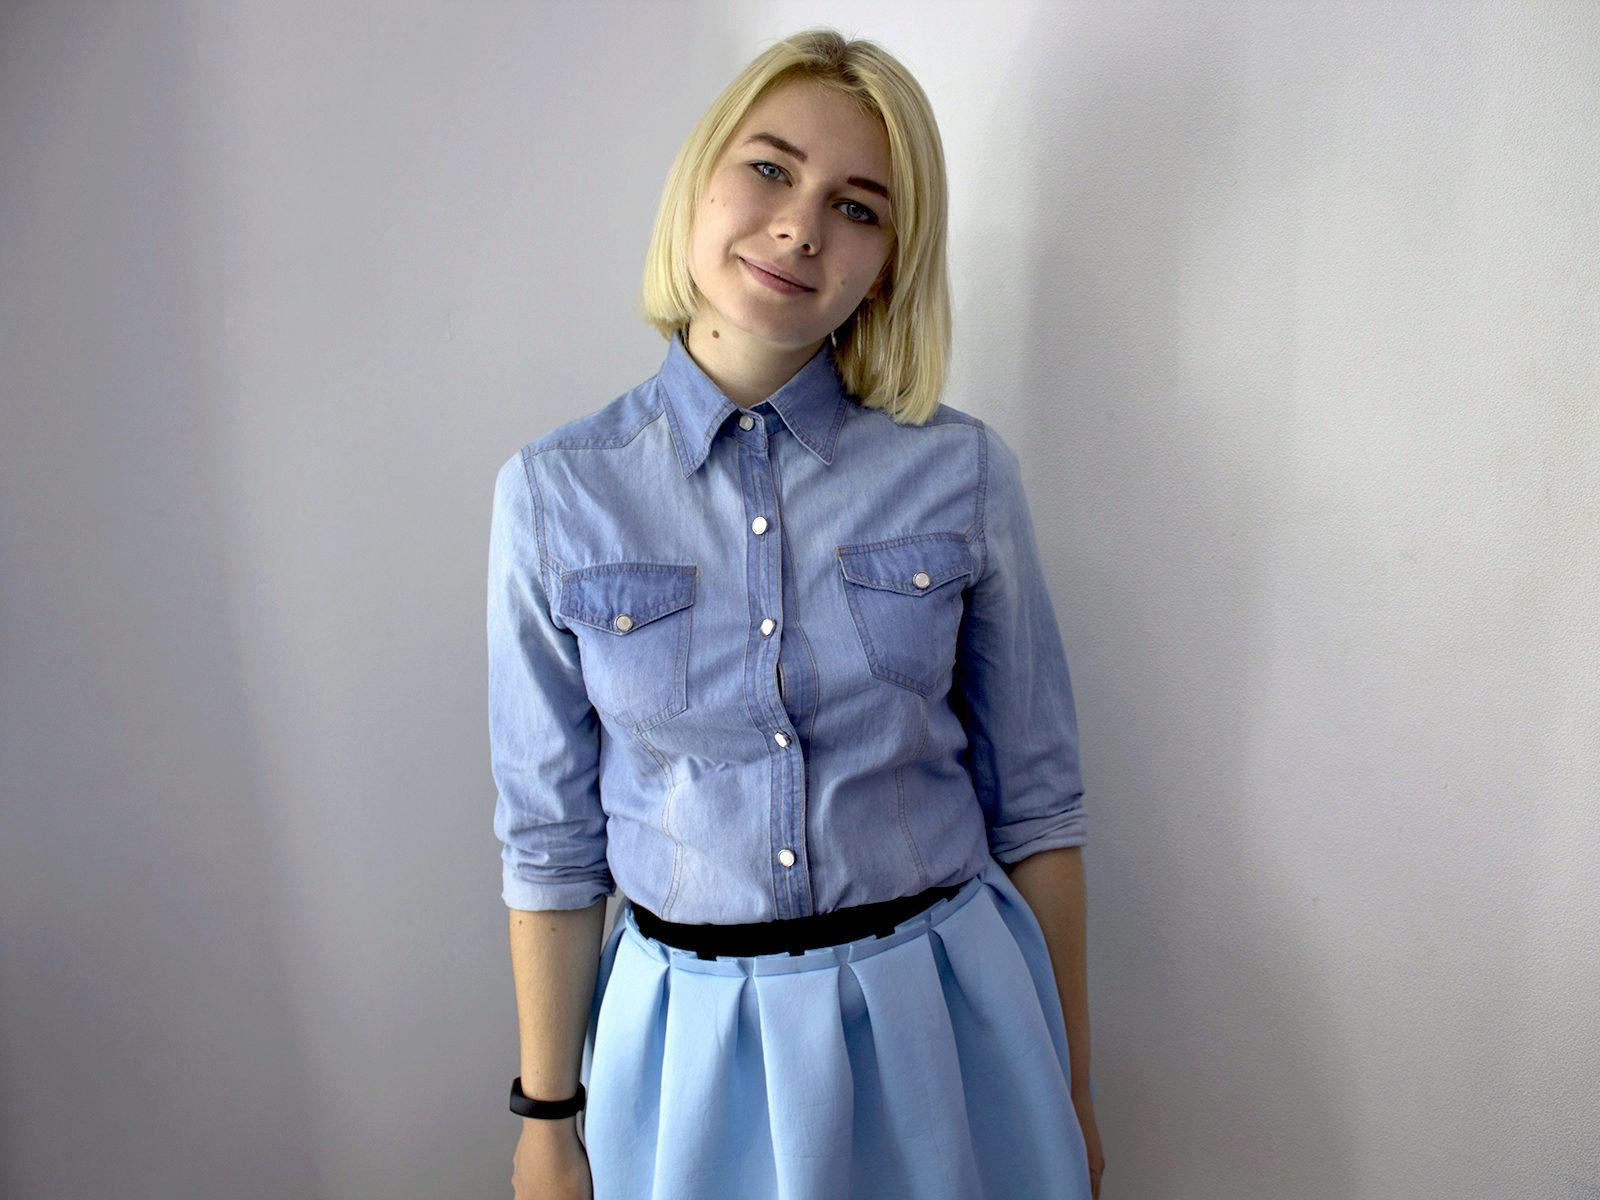 Webcam model Olivia Maxwell from WebPowerCam